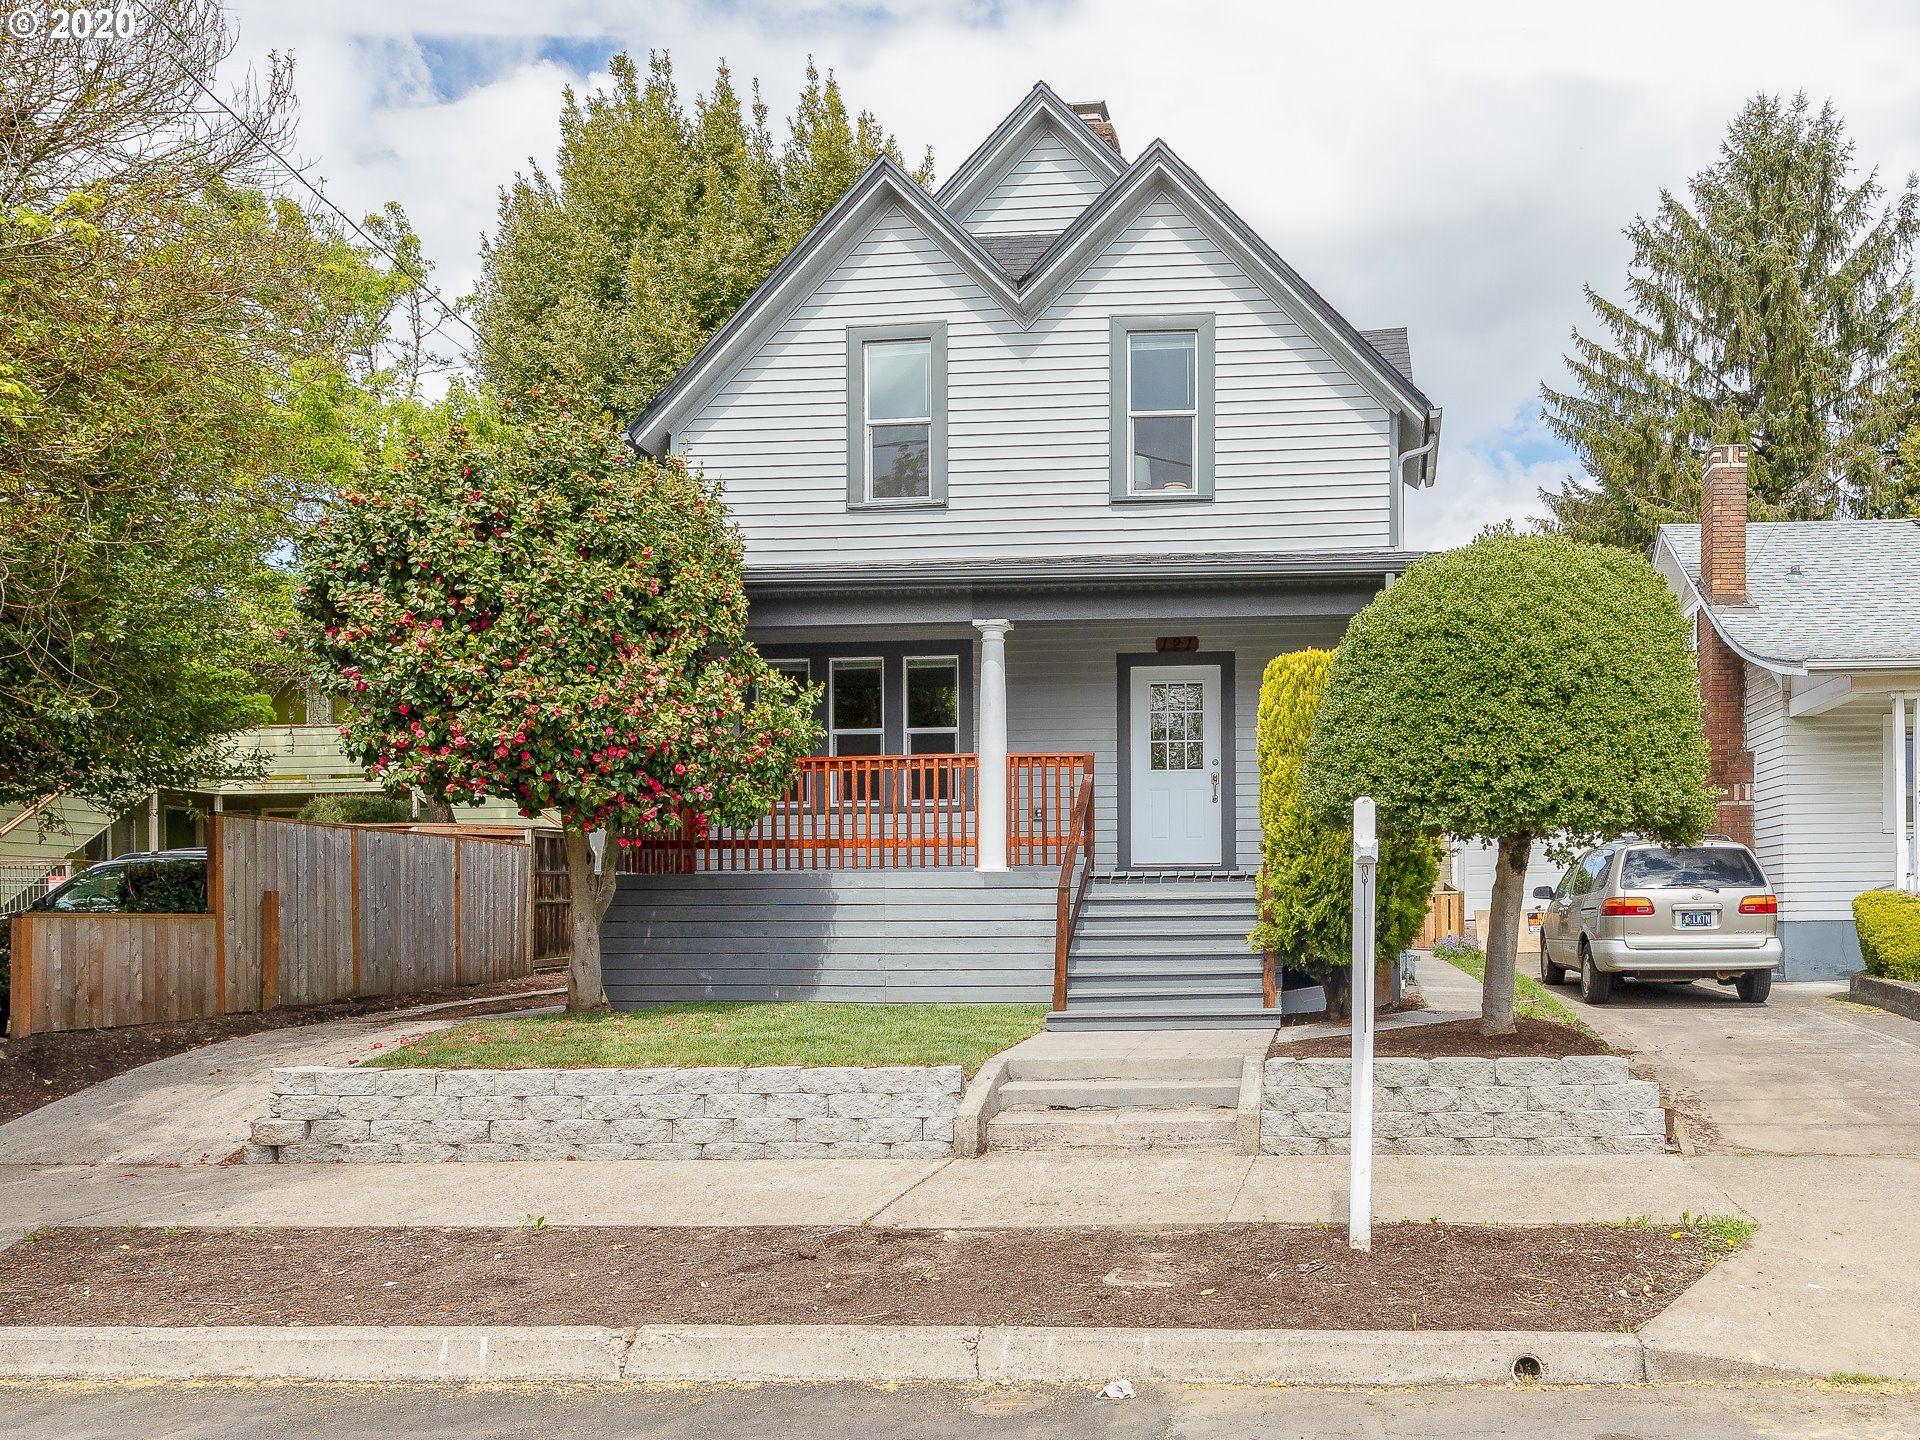 121 NE KNOTT ST, Portland, OR 97212 - MLS#: 20162779